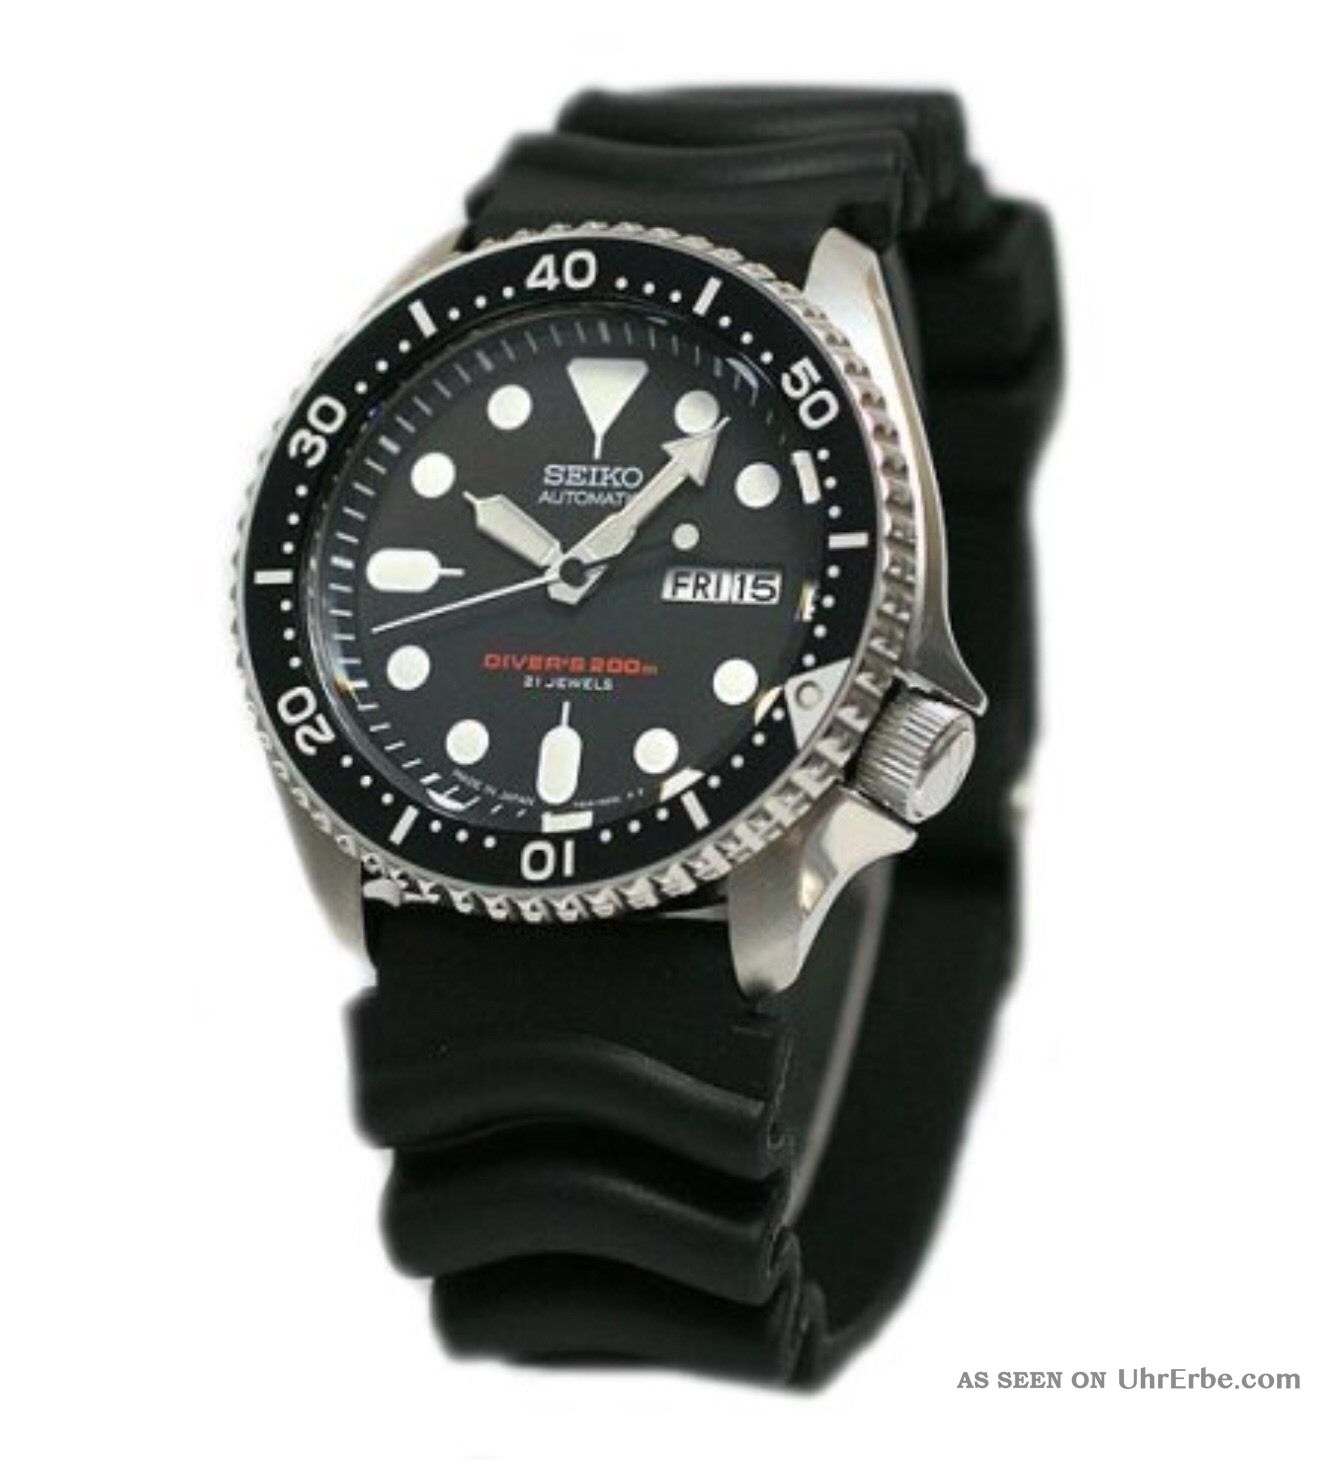 Seiko Automatik Diver ' S Skx007kc Armbanduhren Bild